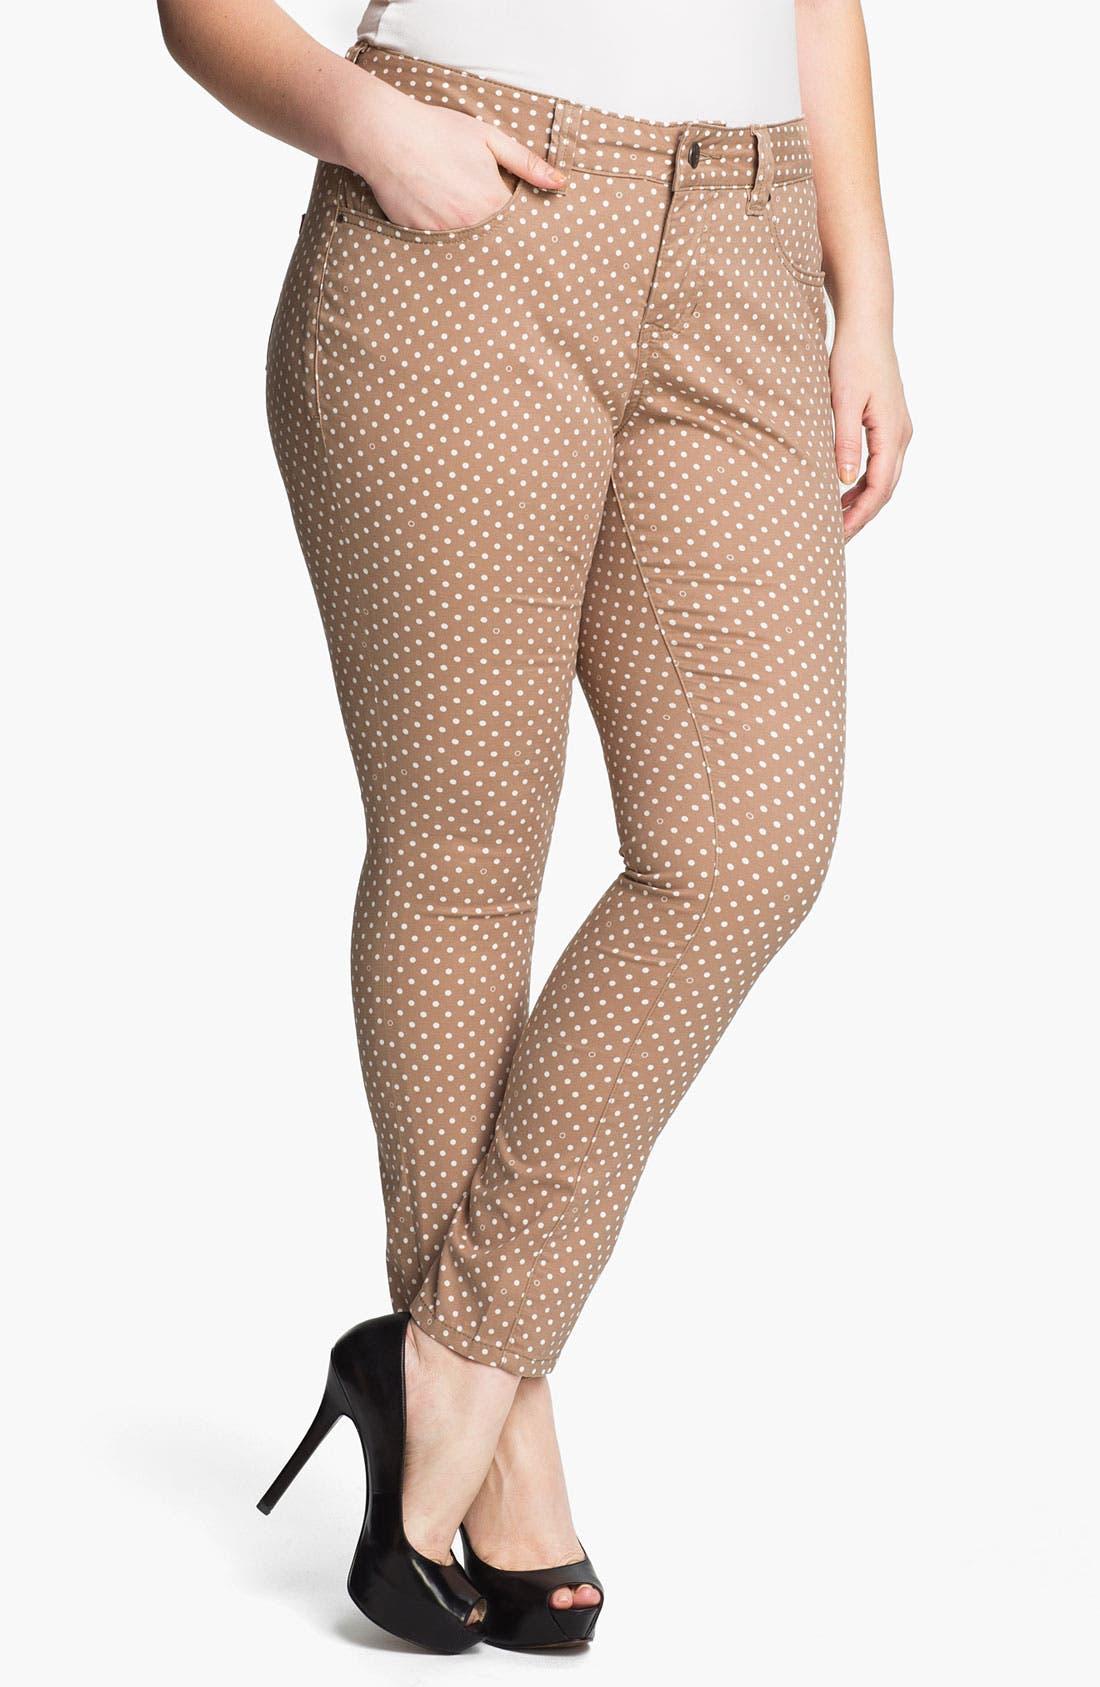 Alternate Image 1 Selected - Jag Jeans Polka Dot Slim Ankle Jeans (Plus Size)